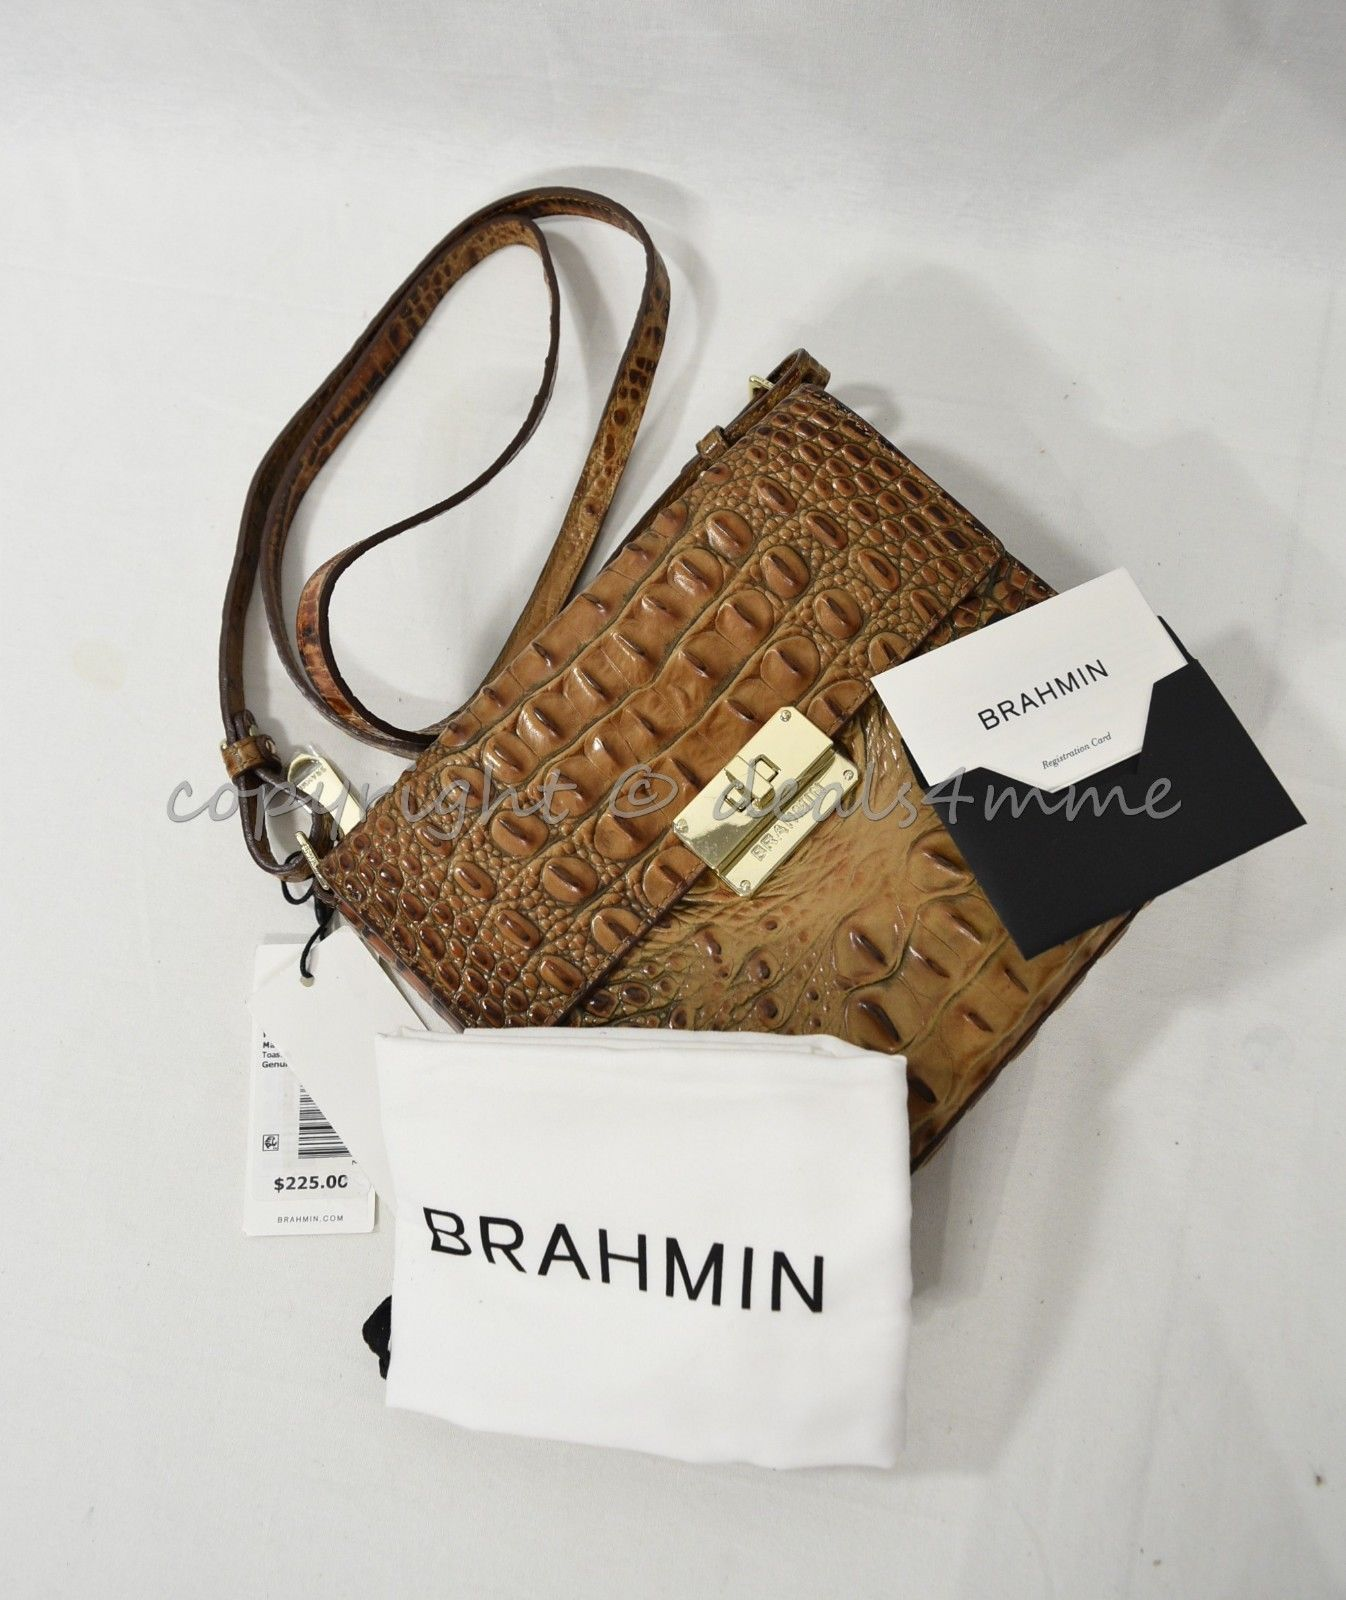 NWT Brahmin Manhattan Leather Shoulder/Crossbody Bag in Toasted Almond Melbourne image 8